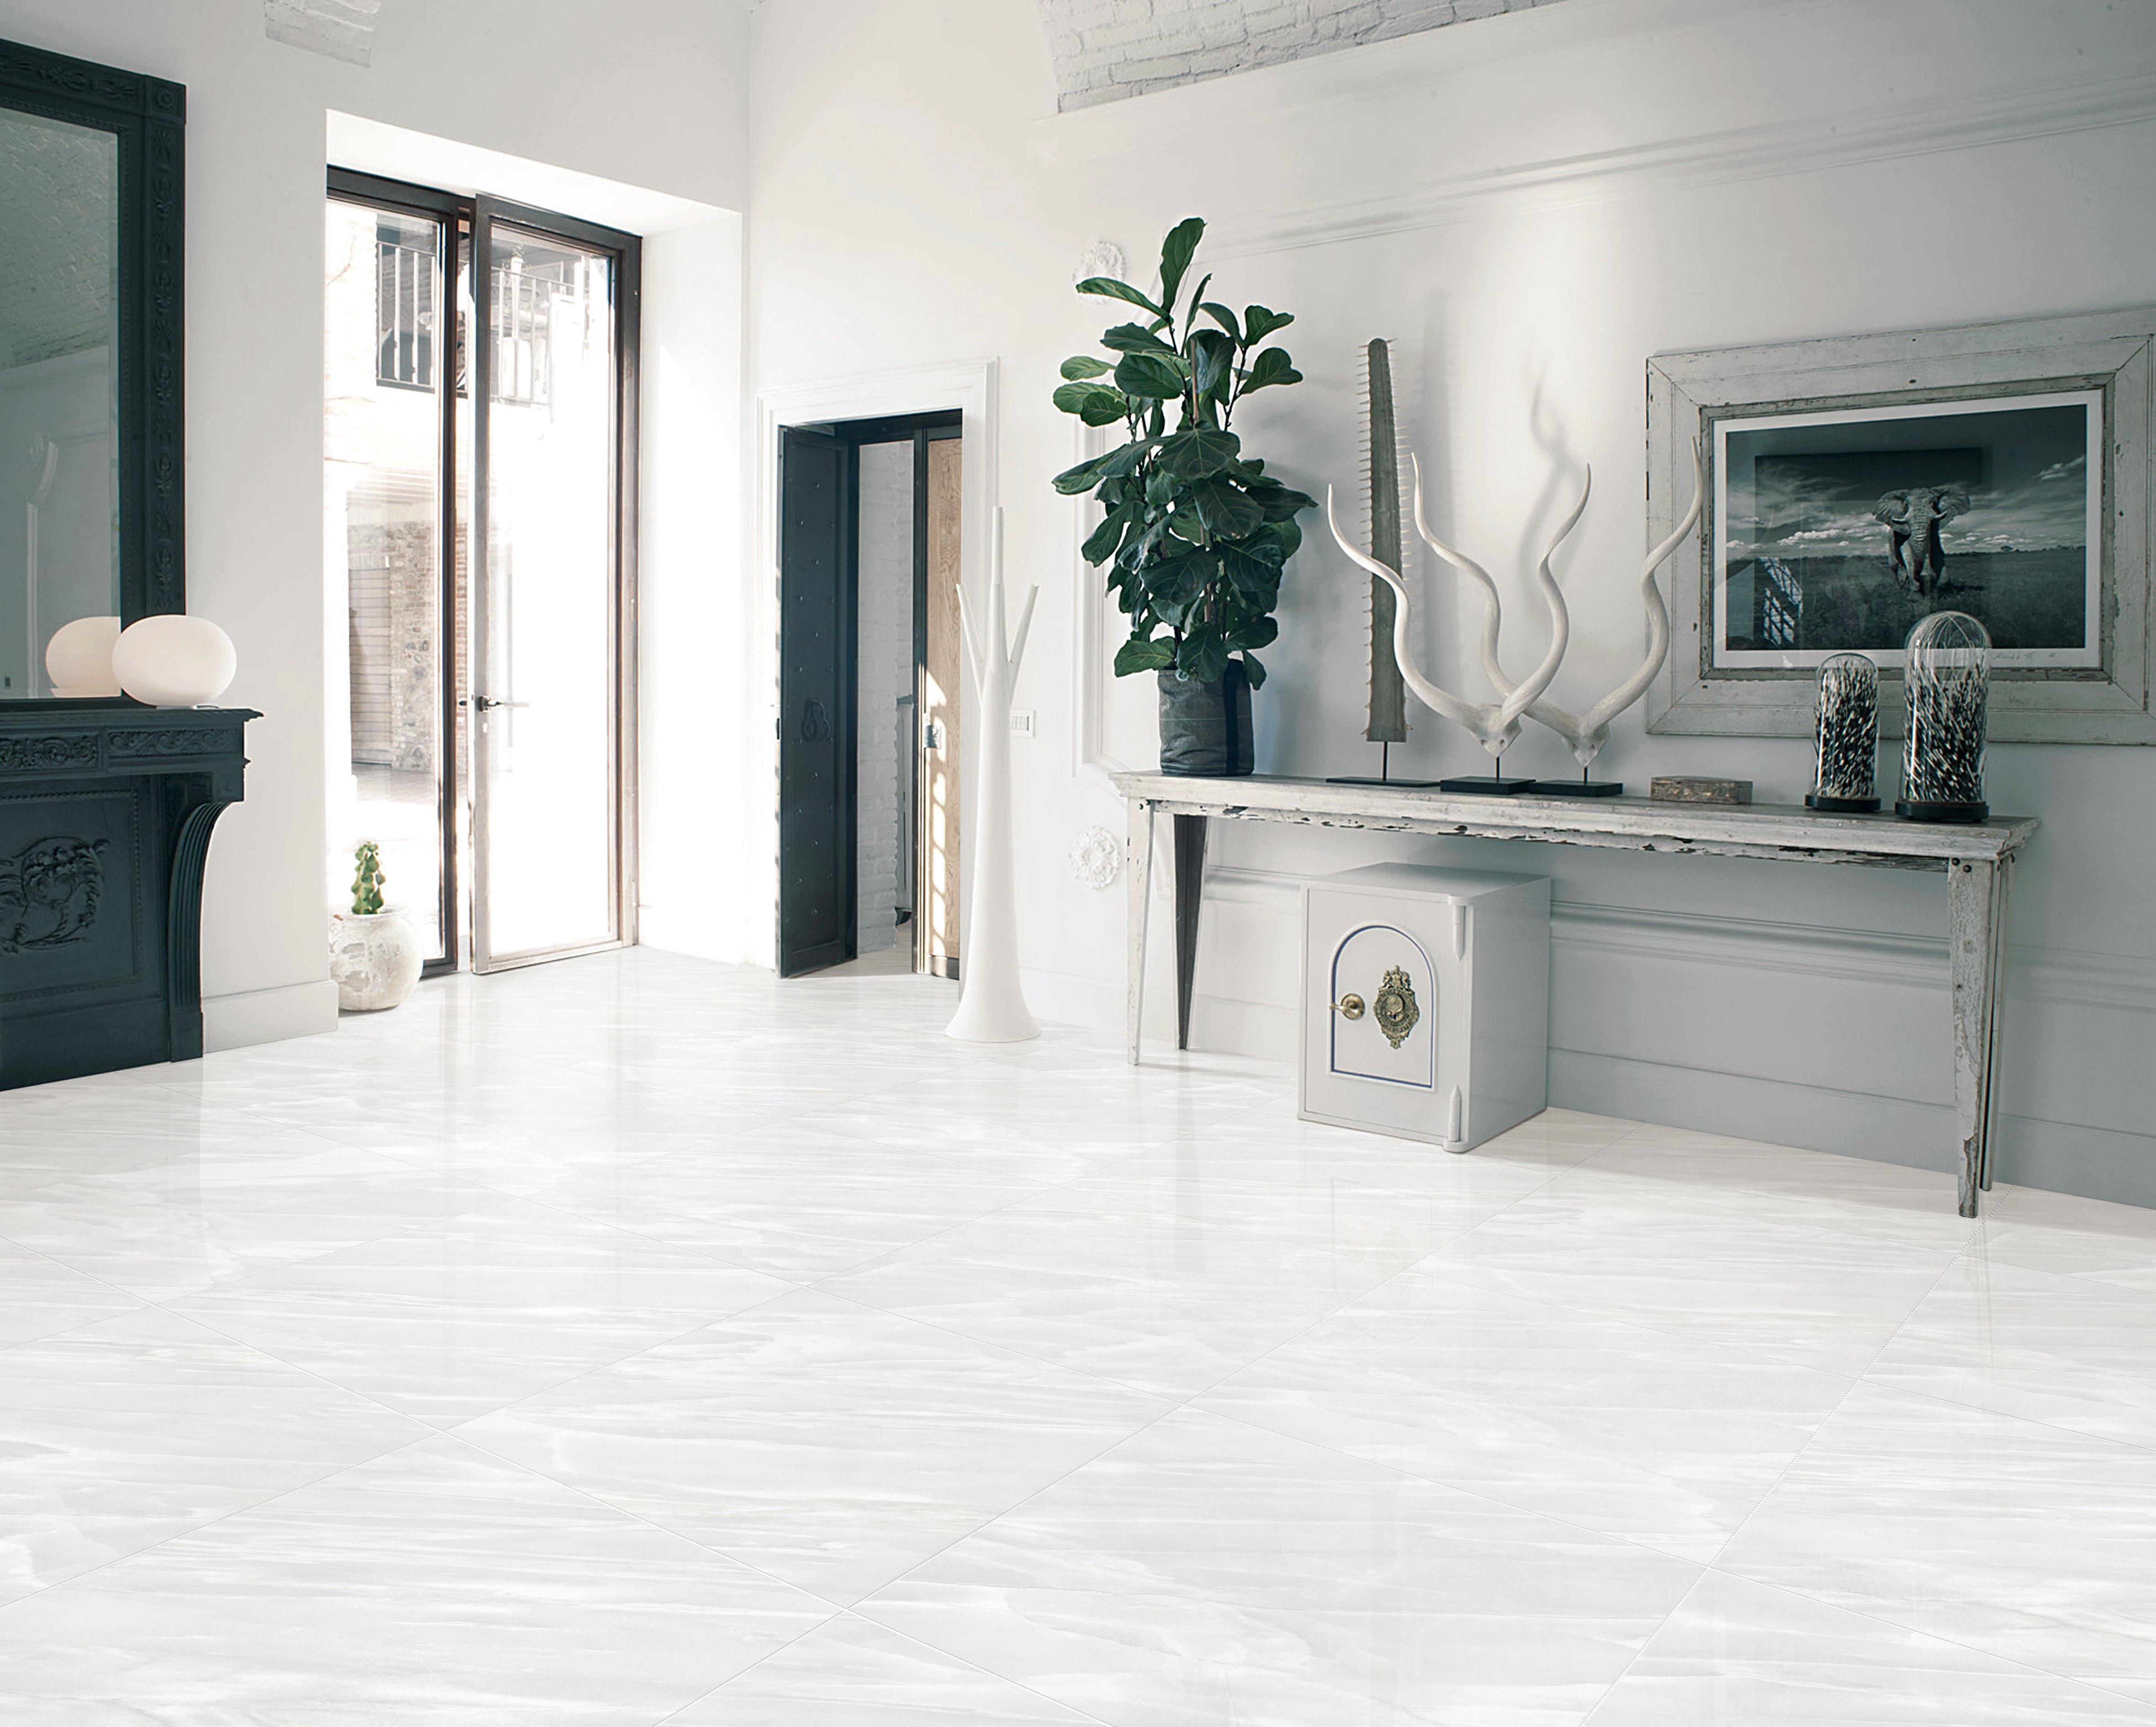 Porcelain Floor. Porcelain Floor P - Mathszone.co